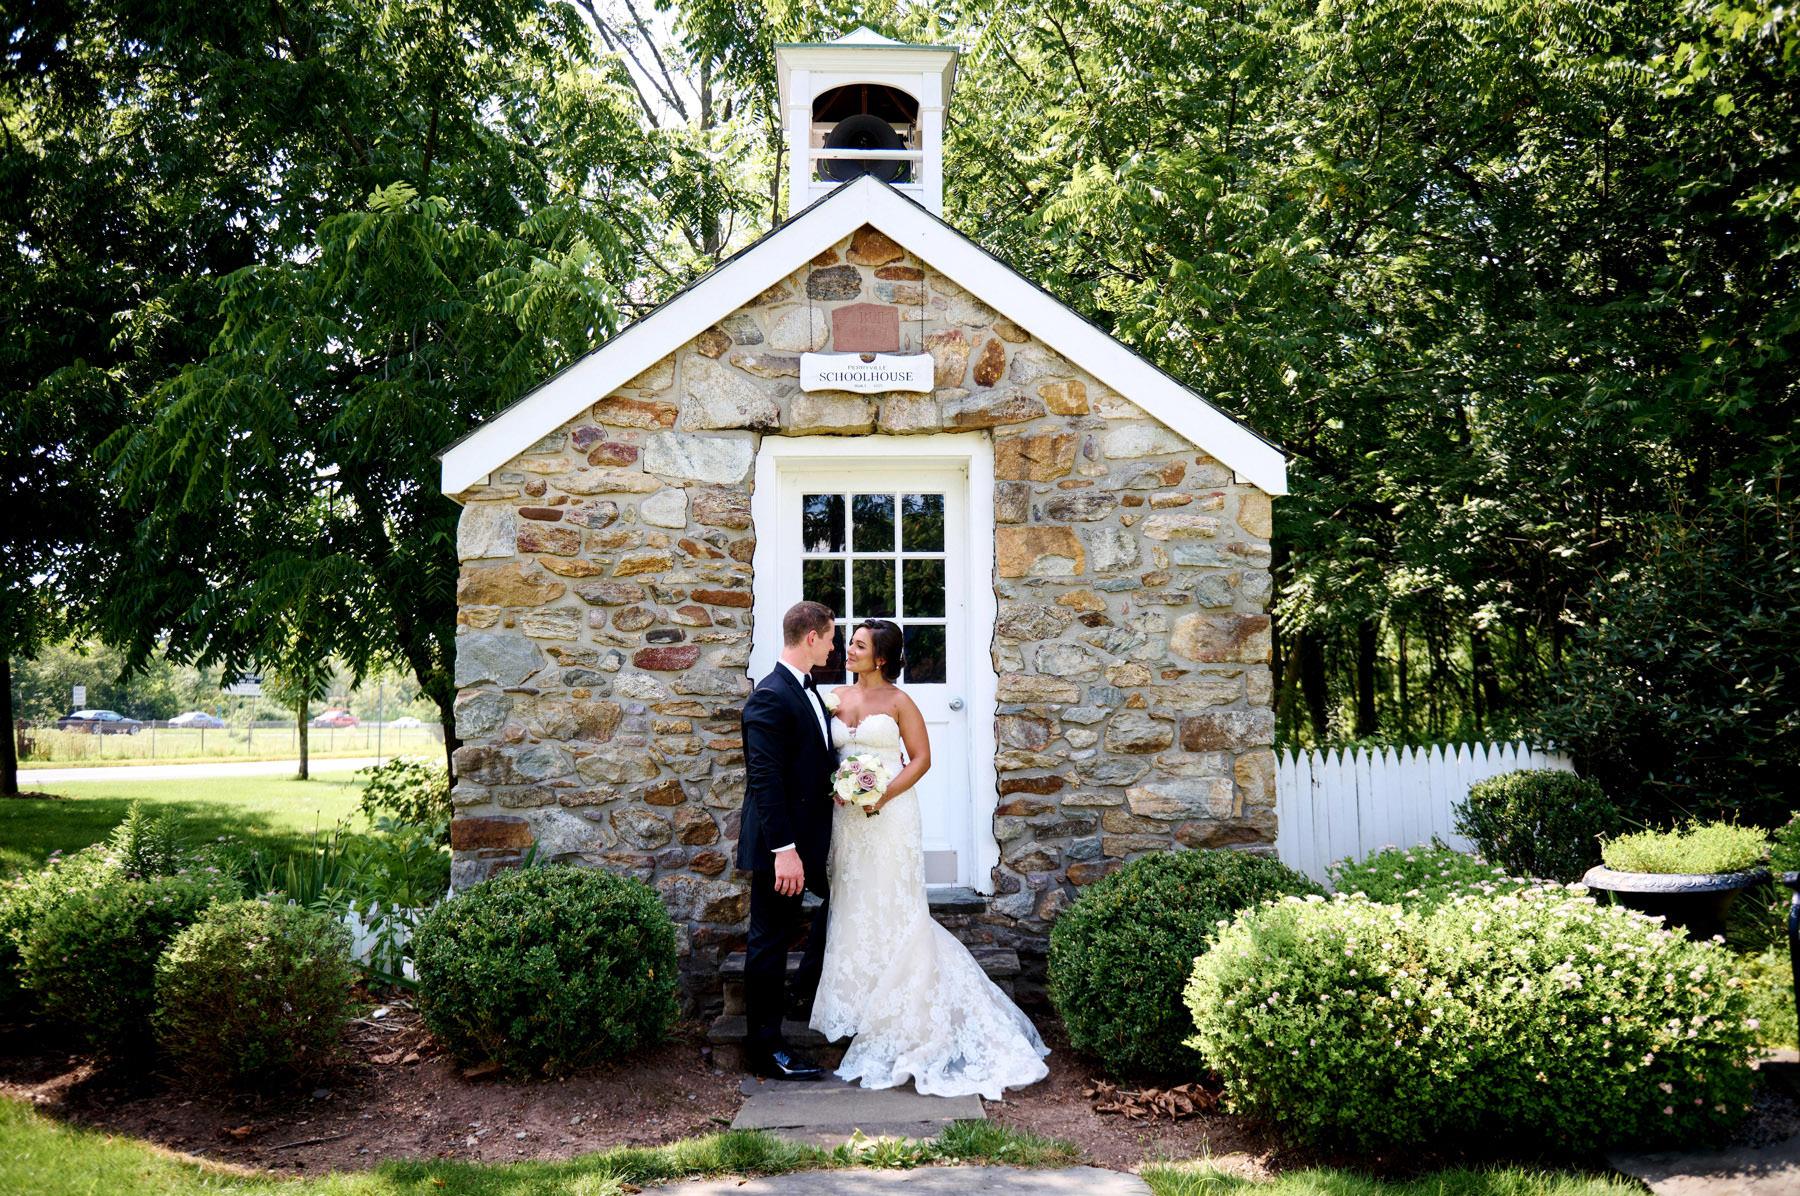 The school house at The Farmhouse wedding photo